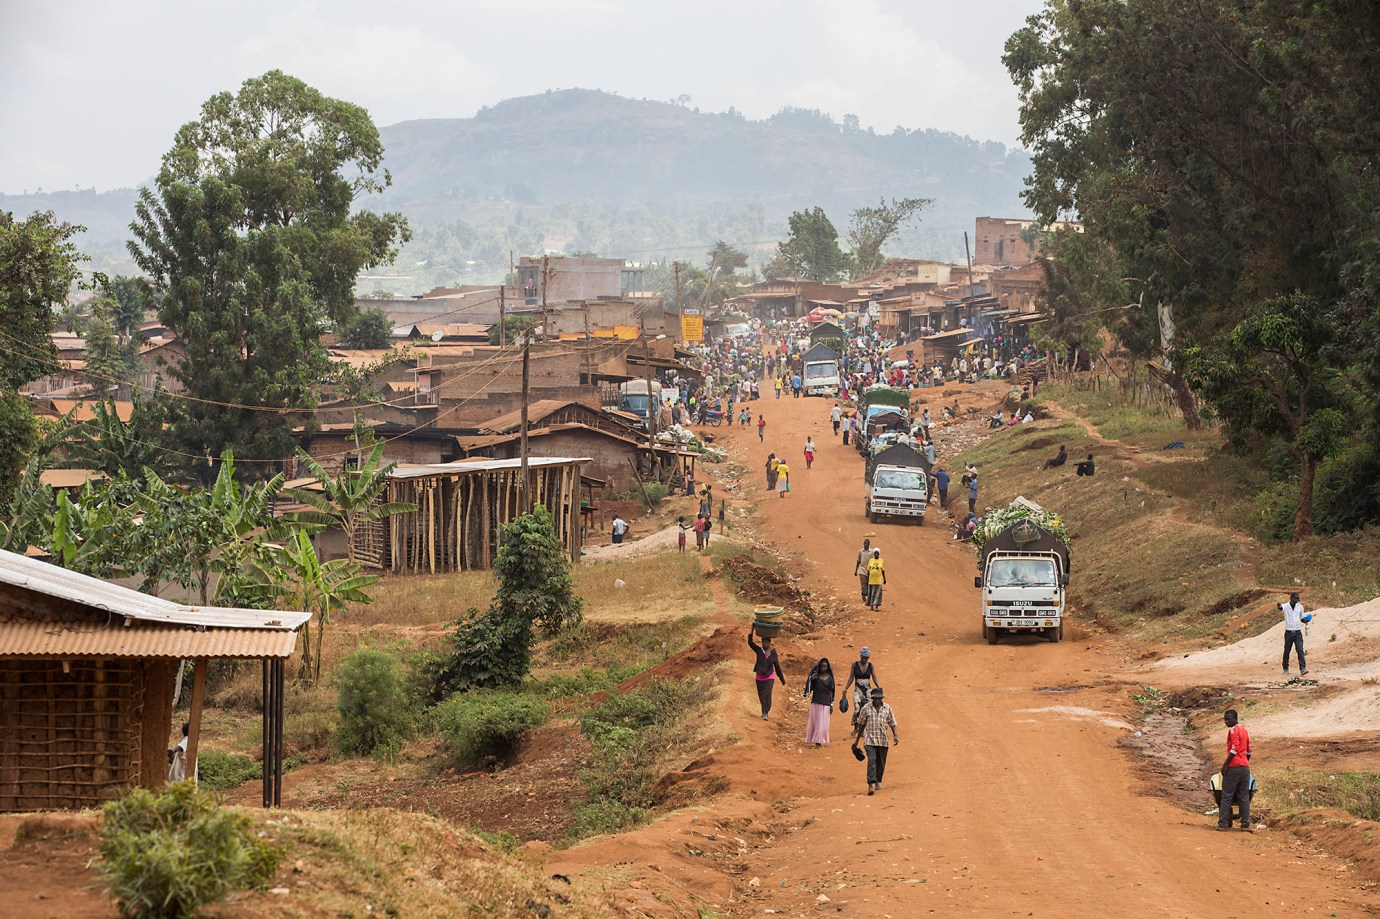 Unpaved roads make for difficult travel on Uganda's Mount Elgon.